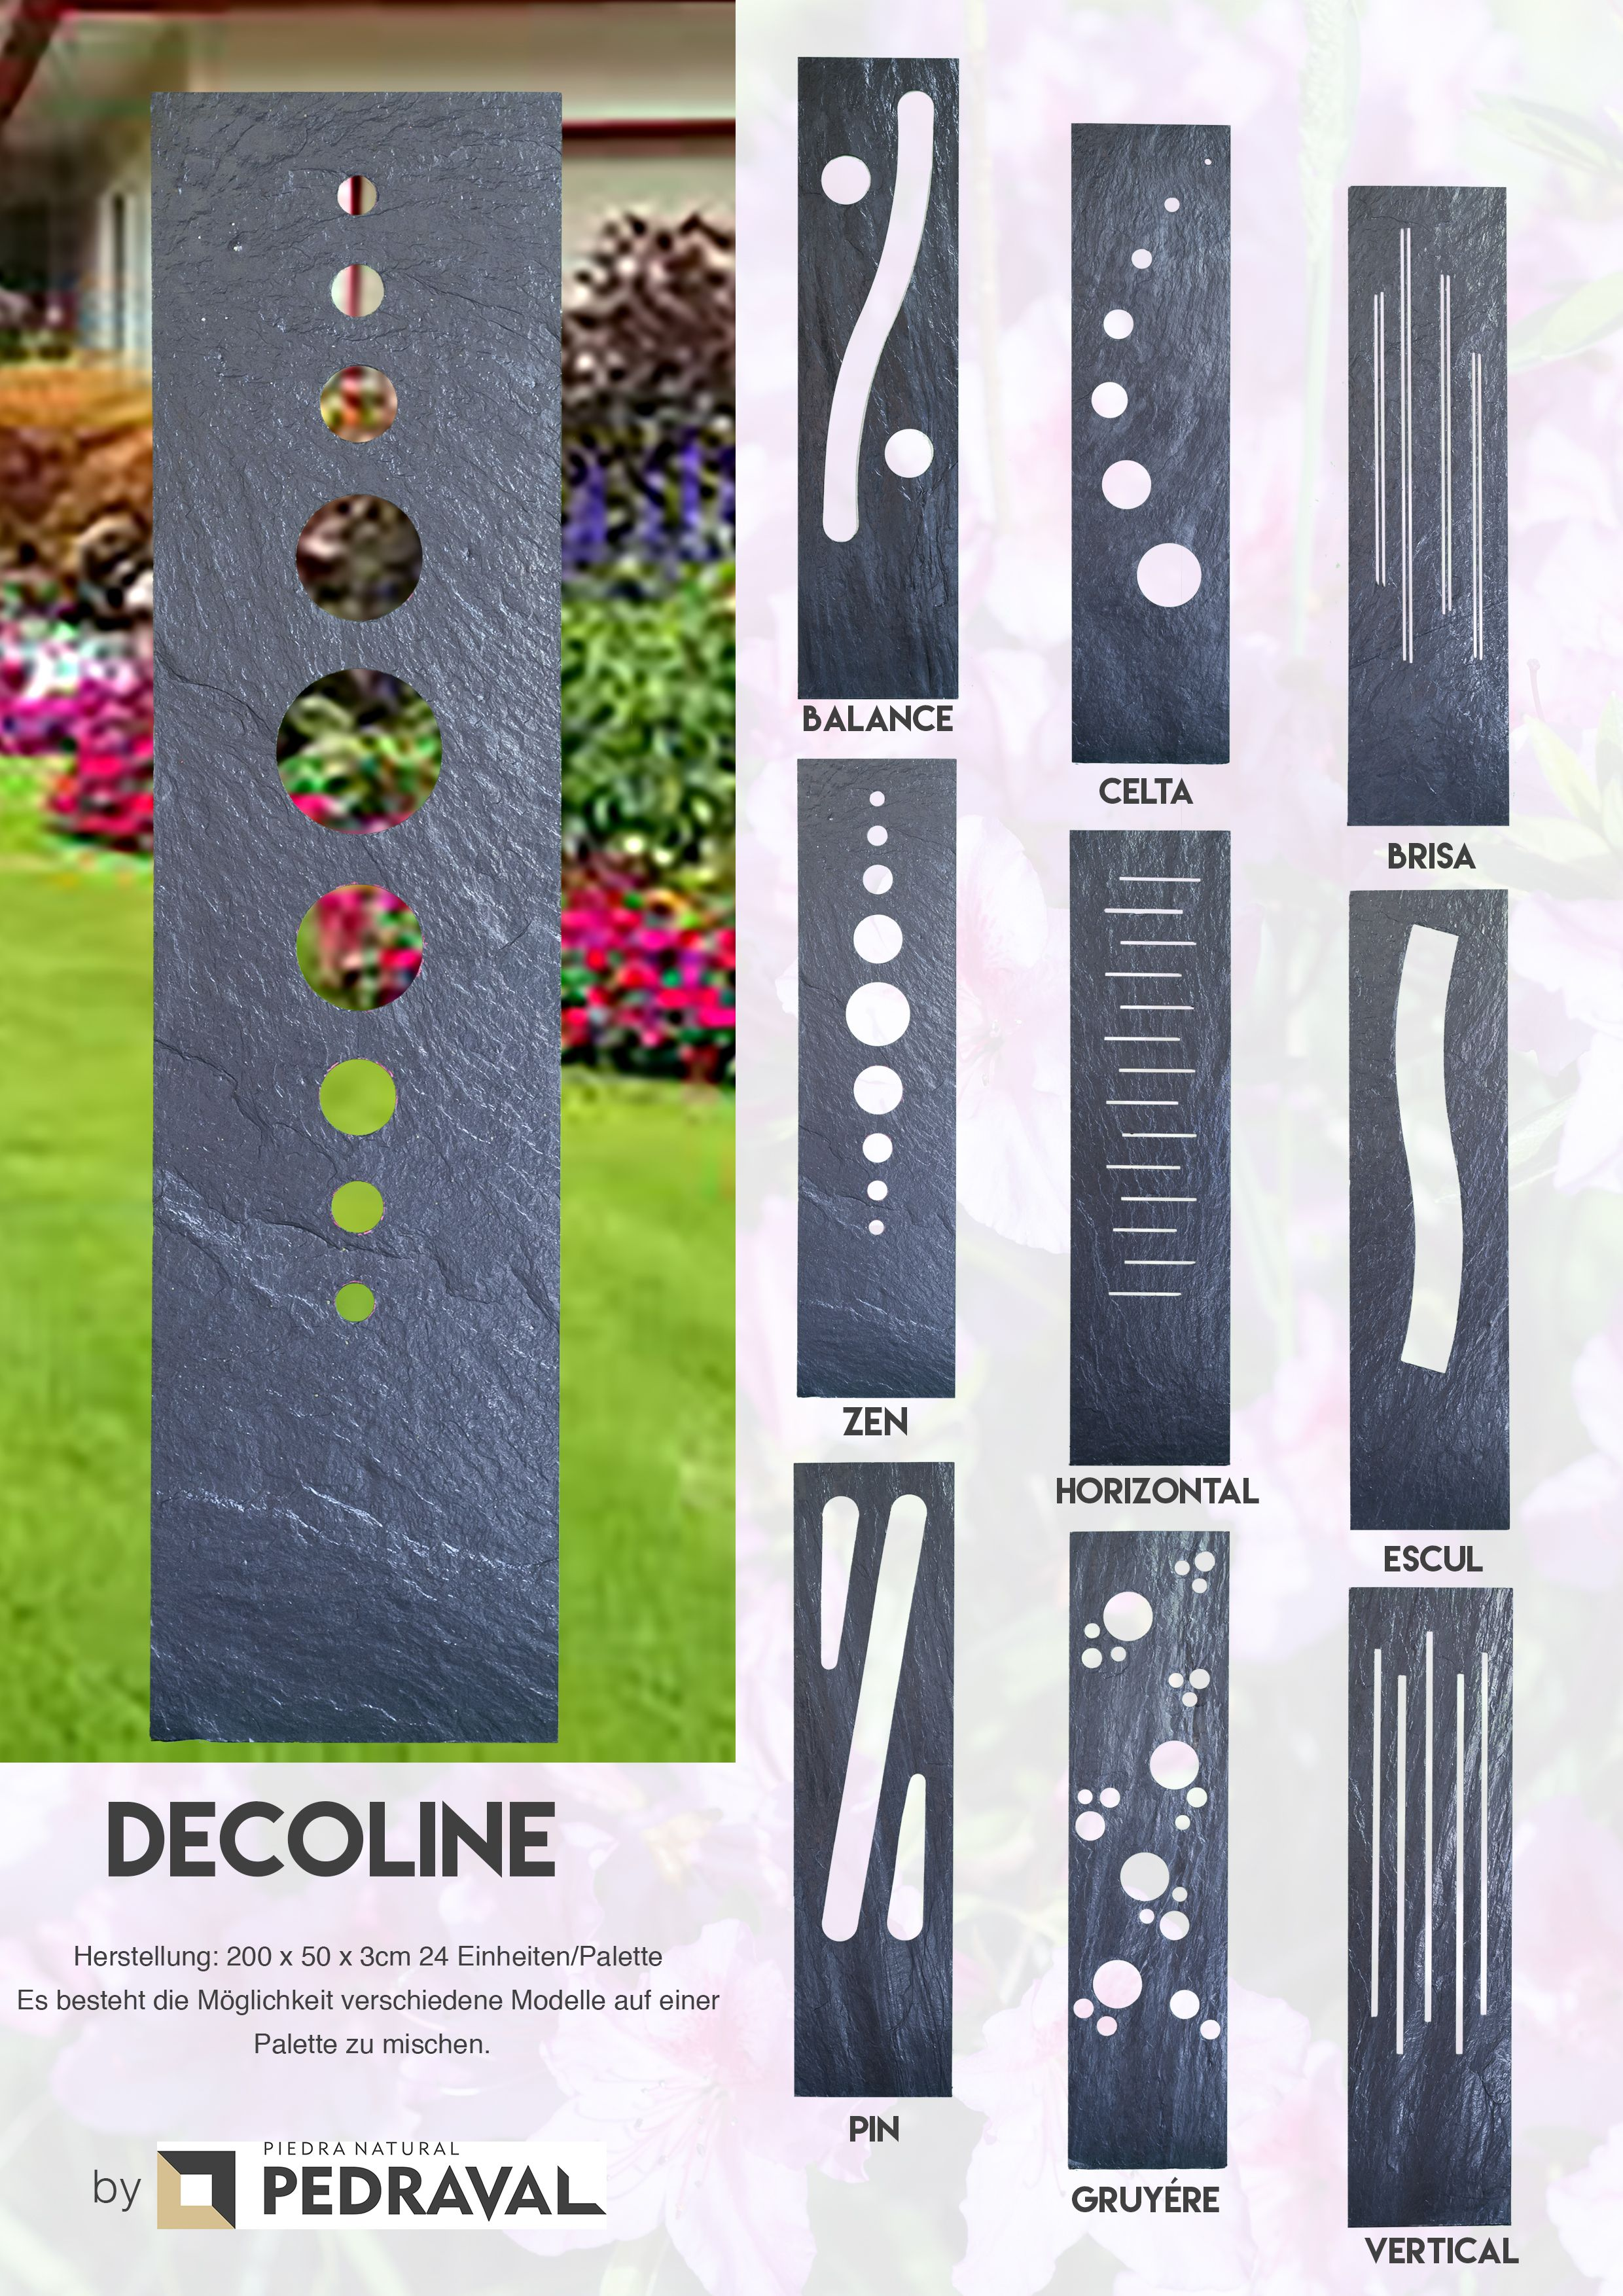 schieferplatten deko garten wohn design. Black Bedroom Furniture Sets. Home Design Ideas